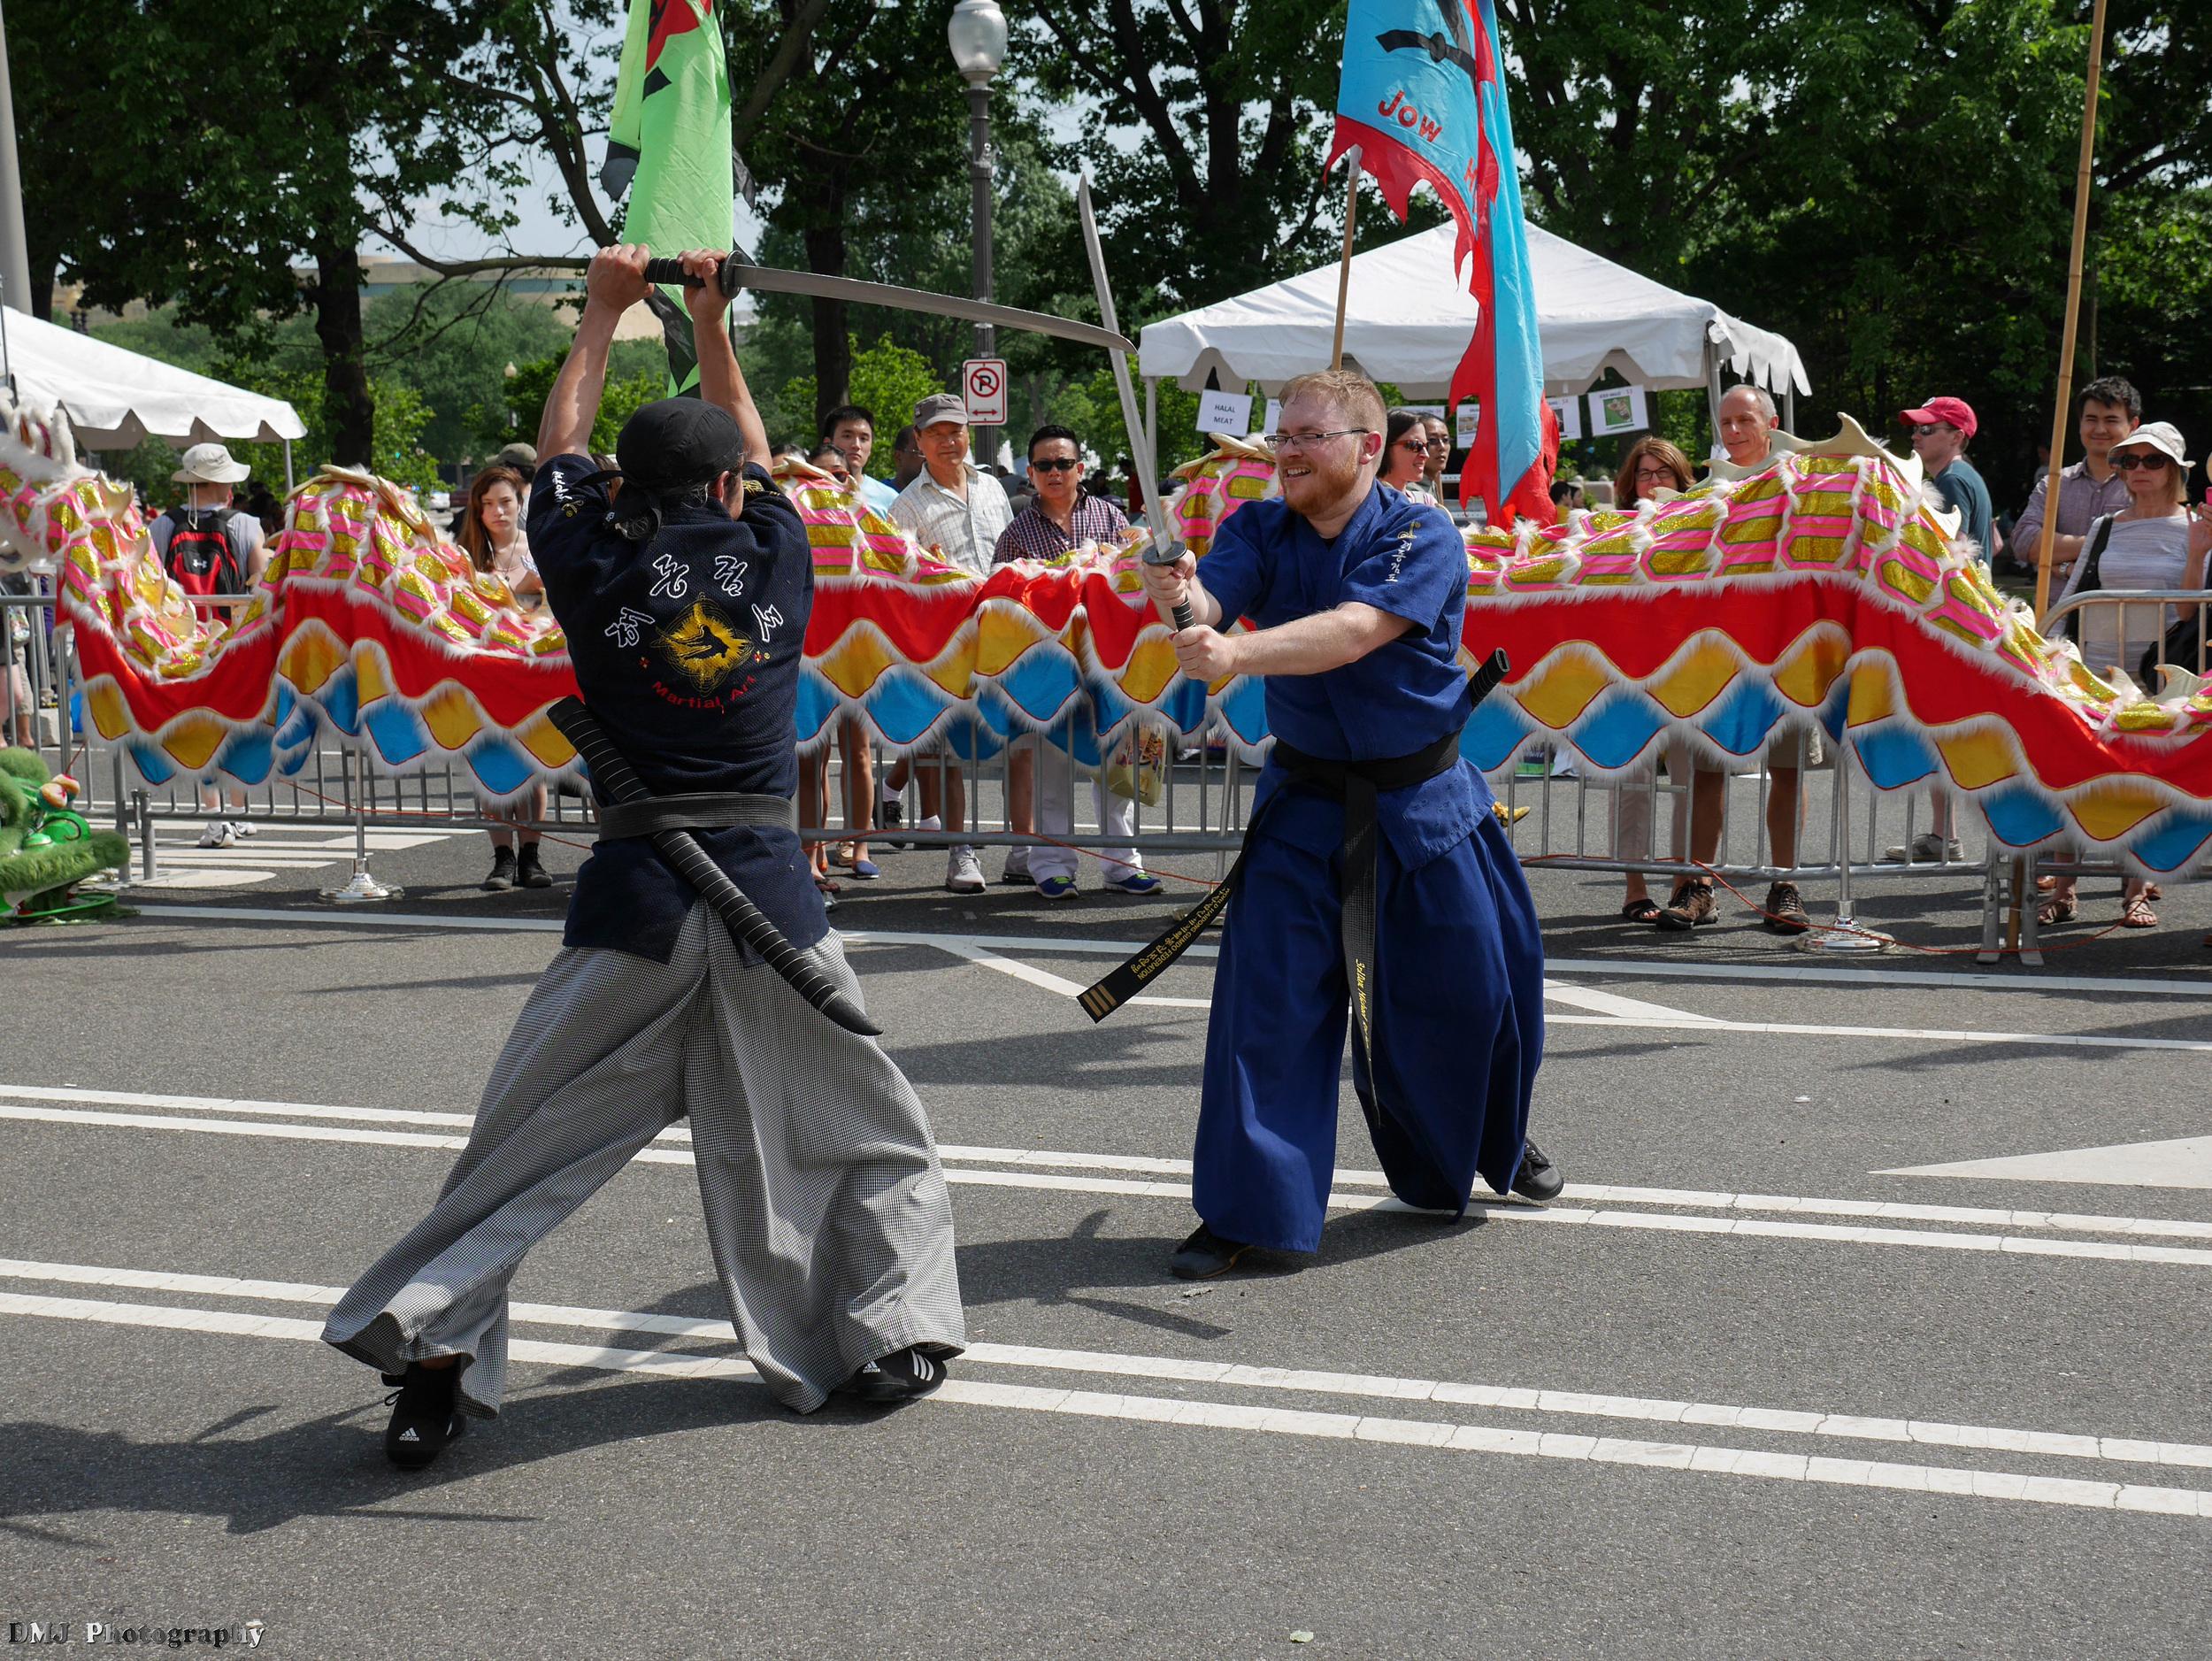 fiesta_asia_street_festival_2015_martial_arts_17.jpg